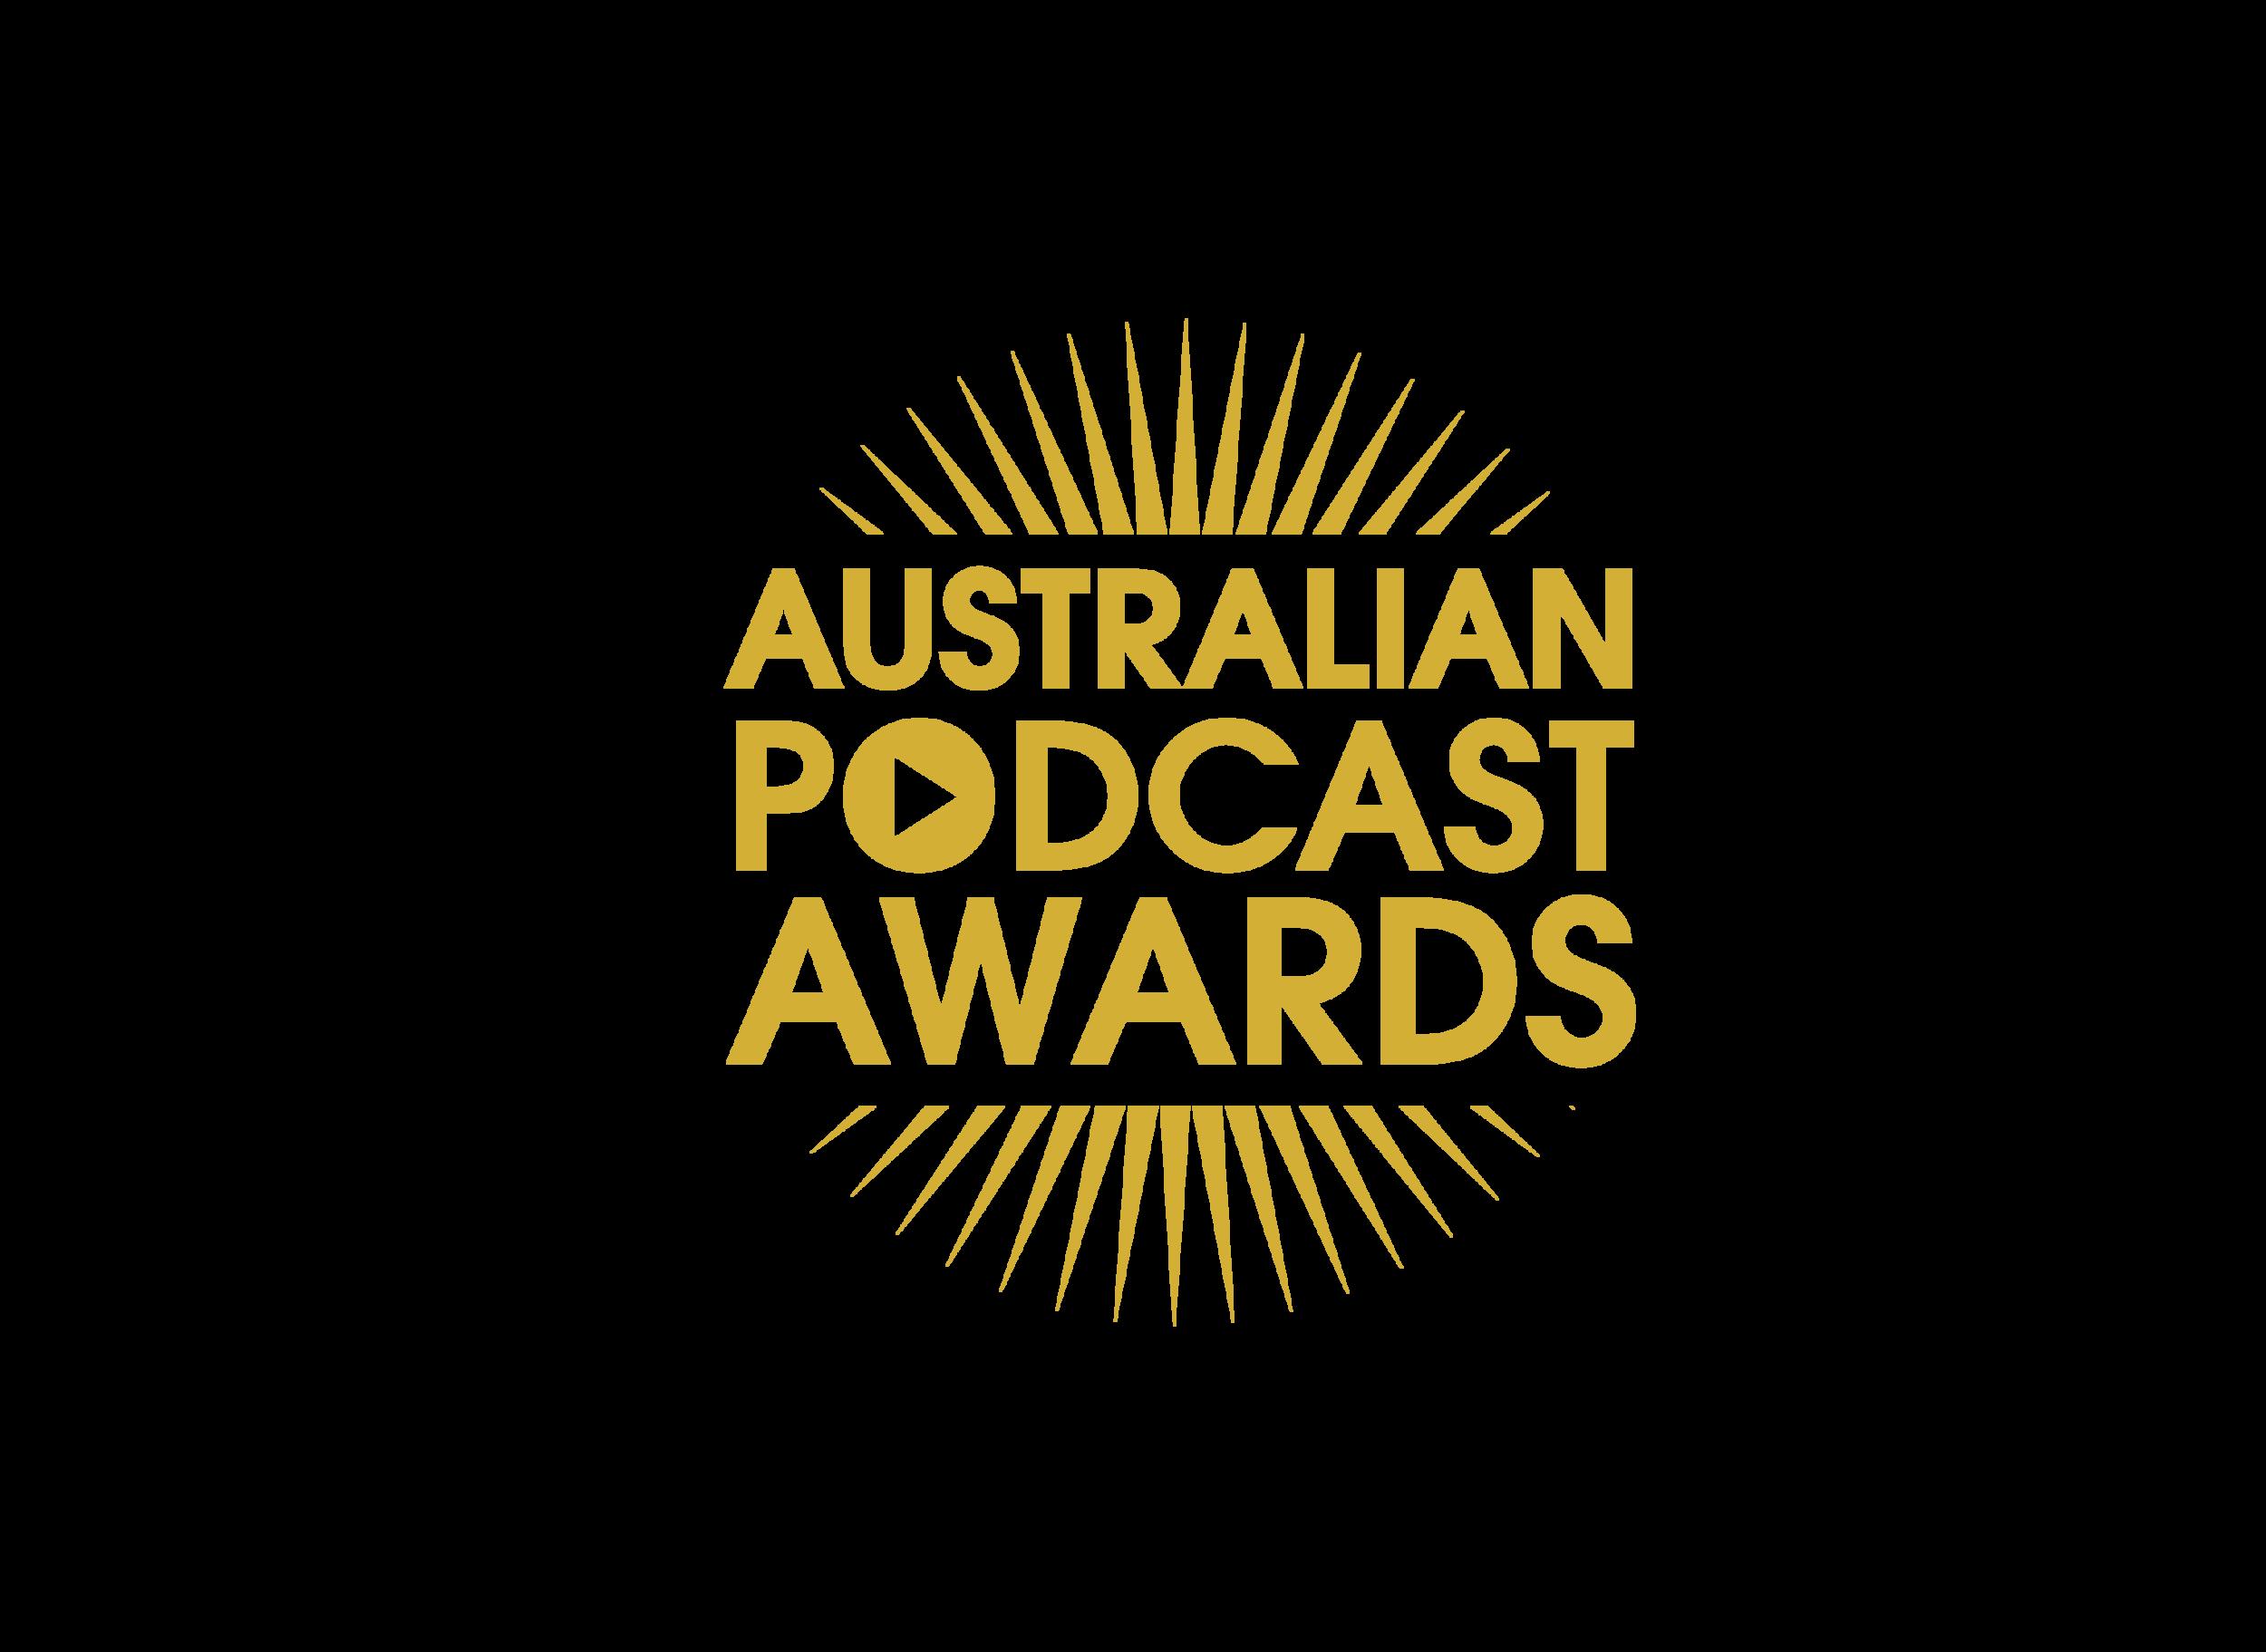 _original_australian-podcast-awards-03.png